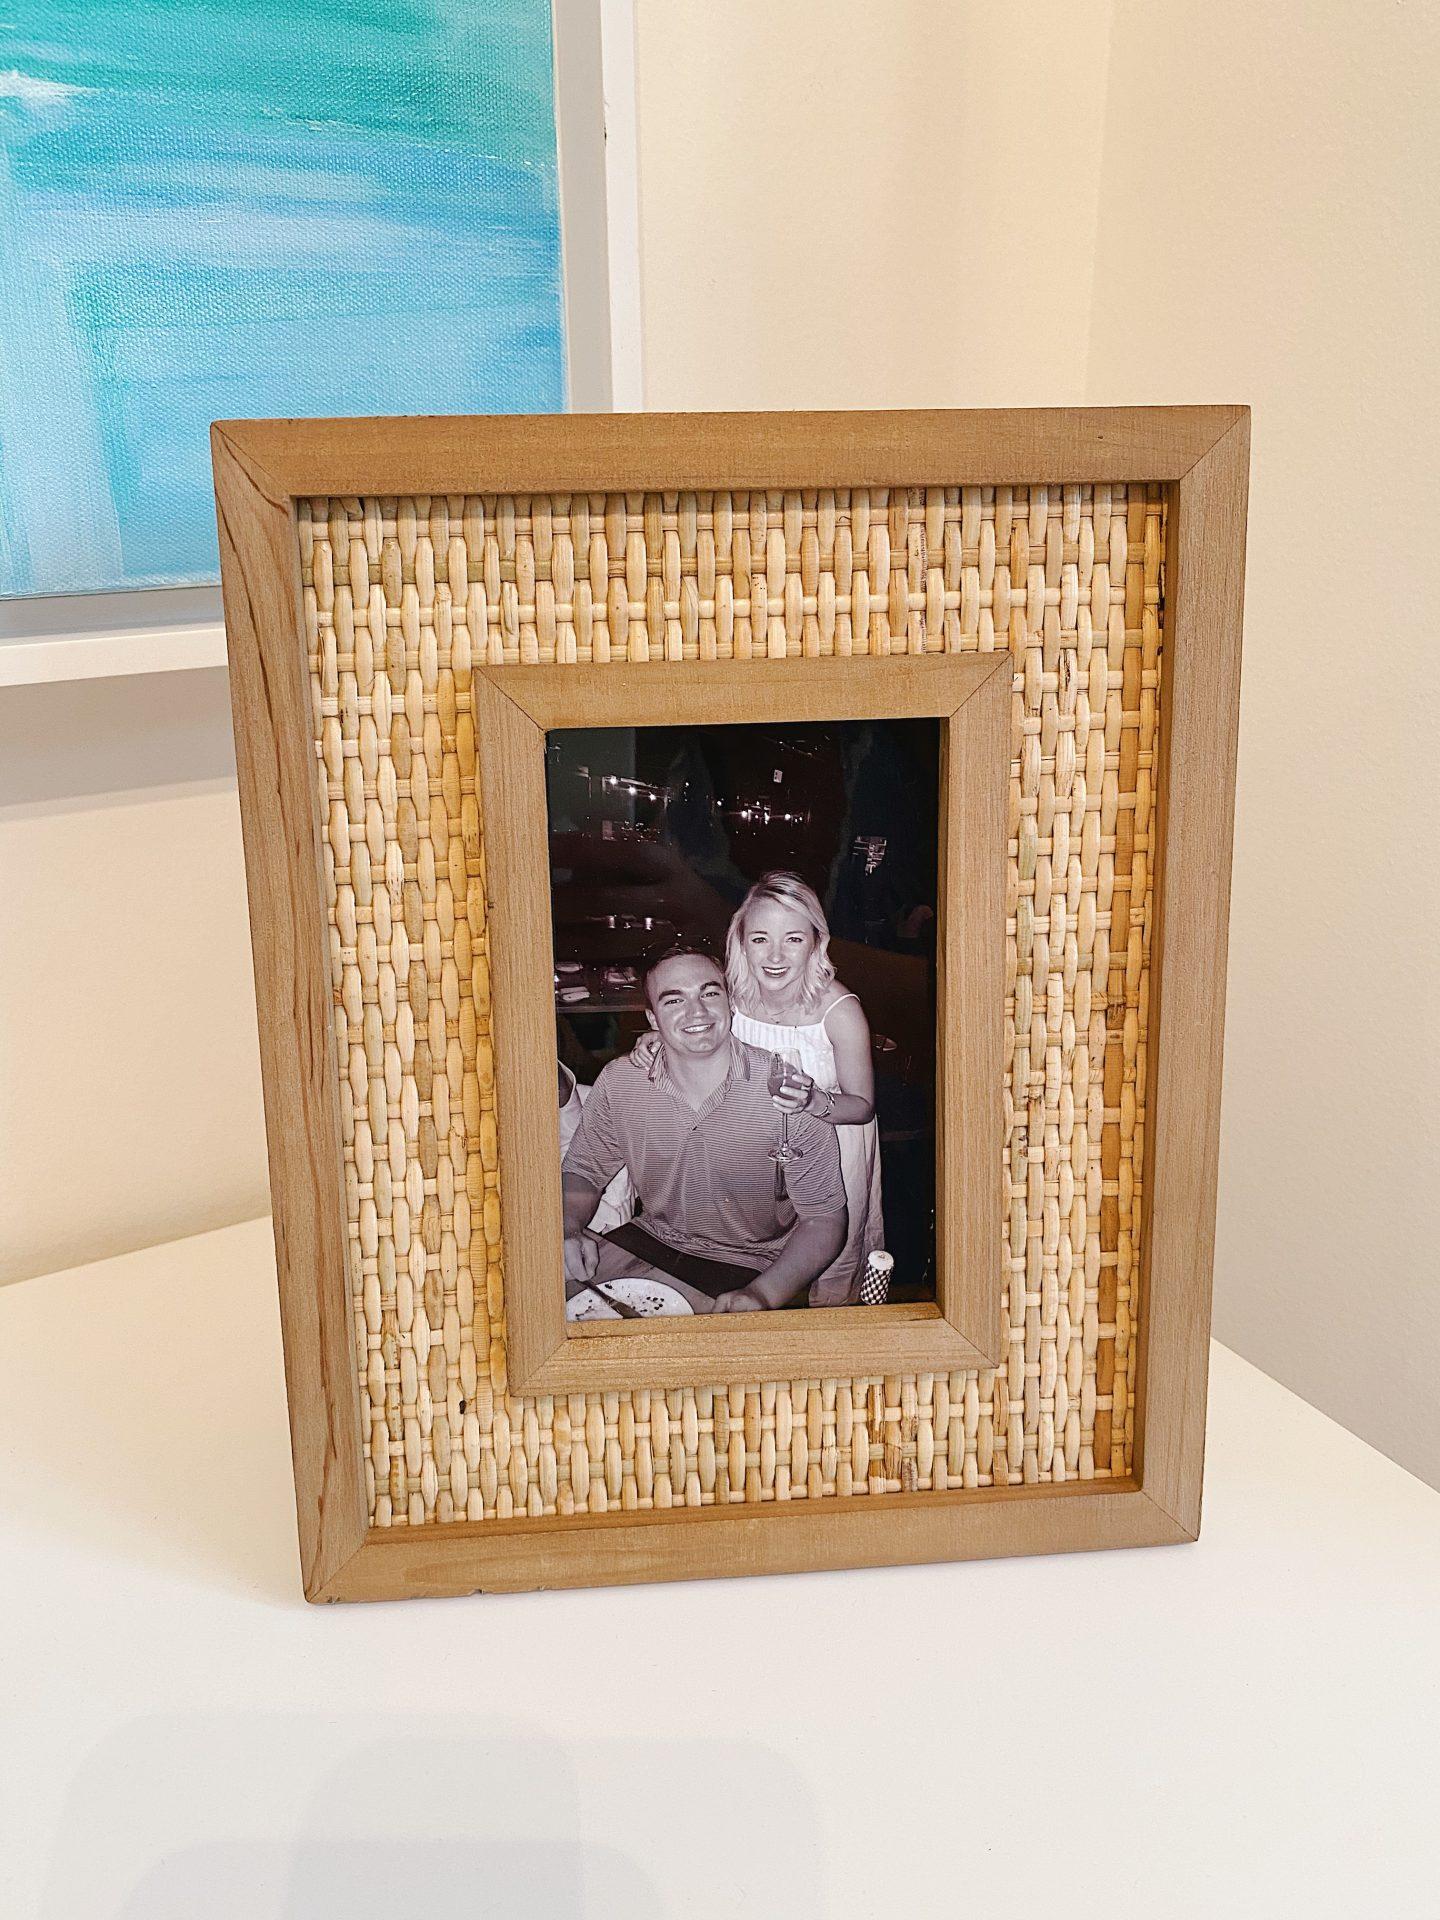 Amazon Prime Home Décor Finds Rattan Wood Frame